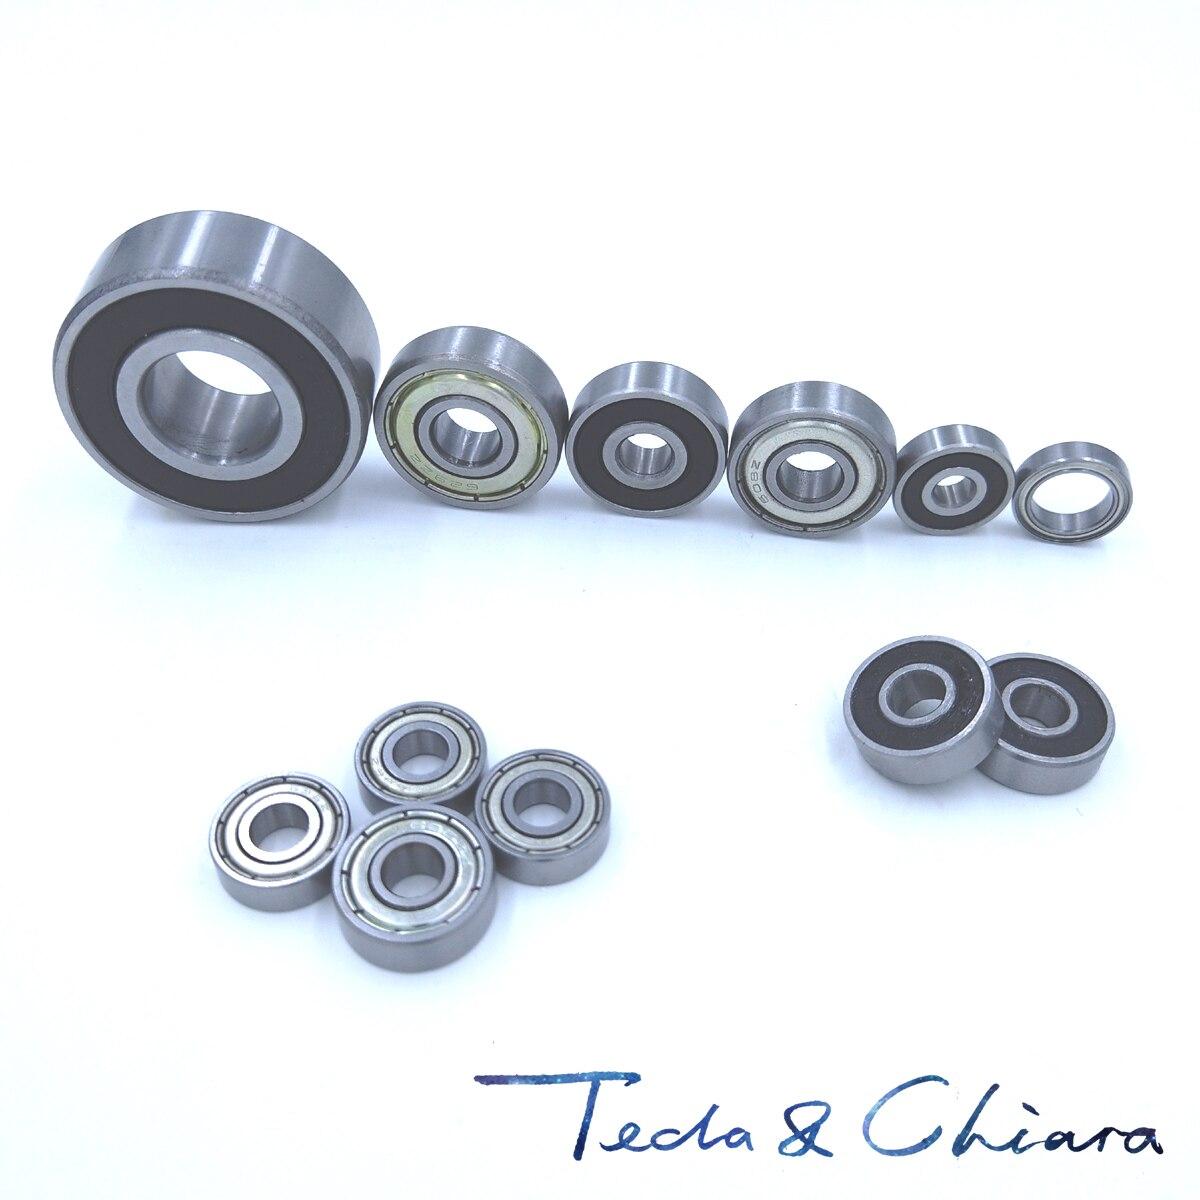 10Pcs MR52 MR52ZZ MR52RS MR52-2Z MR52Z MR52-2RS ZZ RS RZ 2RZ L-520ZZ 638/2X2 Deep Groove Ball Bearings 2 x 5 x 2.5mm